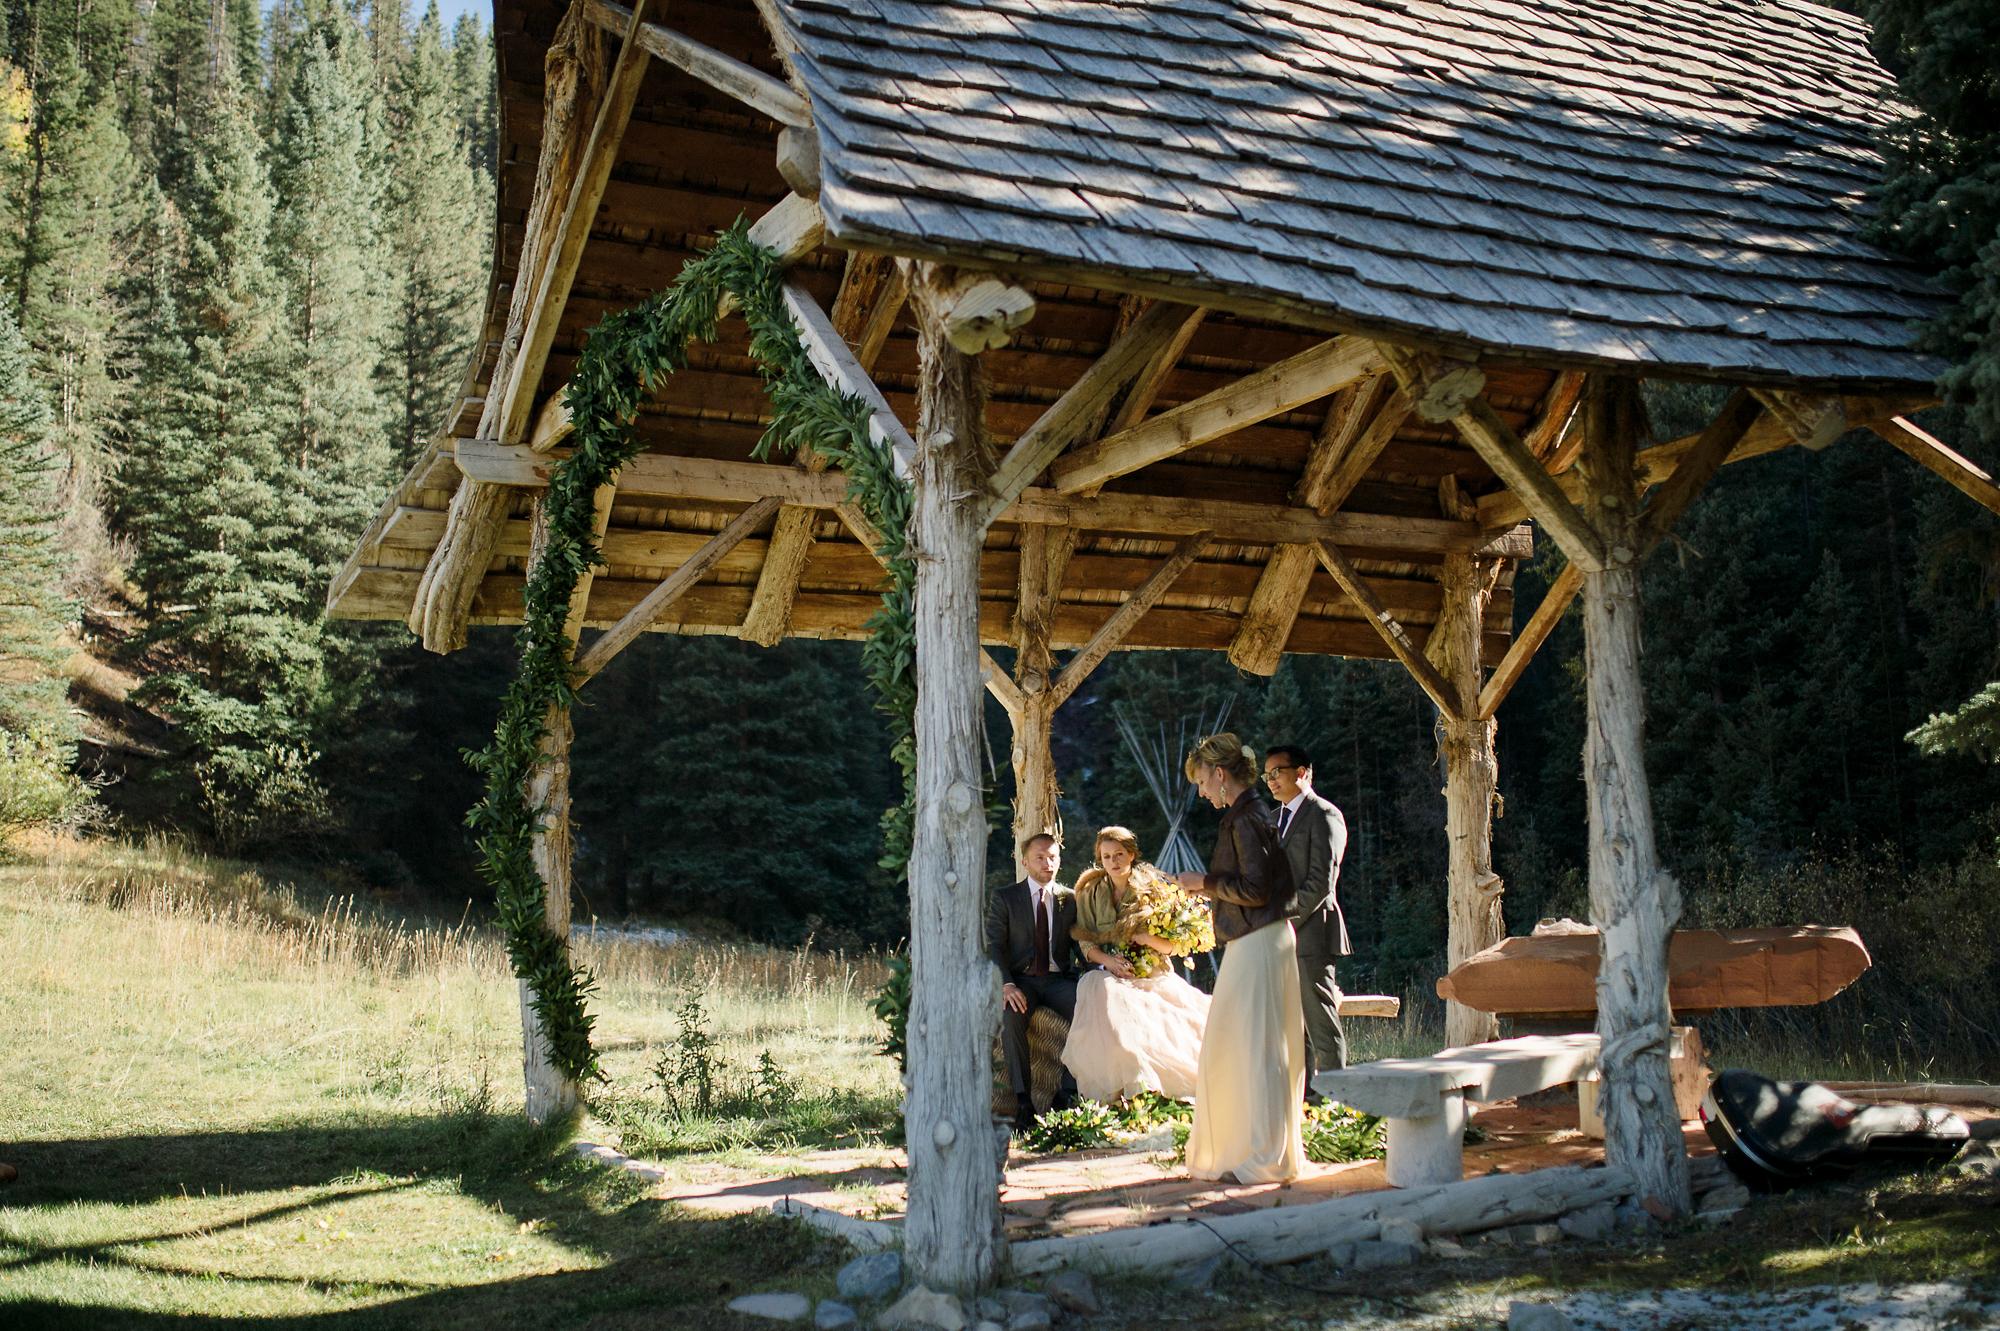 Dunton Hot Springs Wedding Photographer